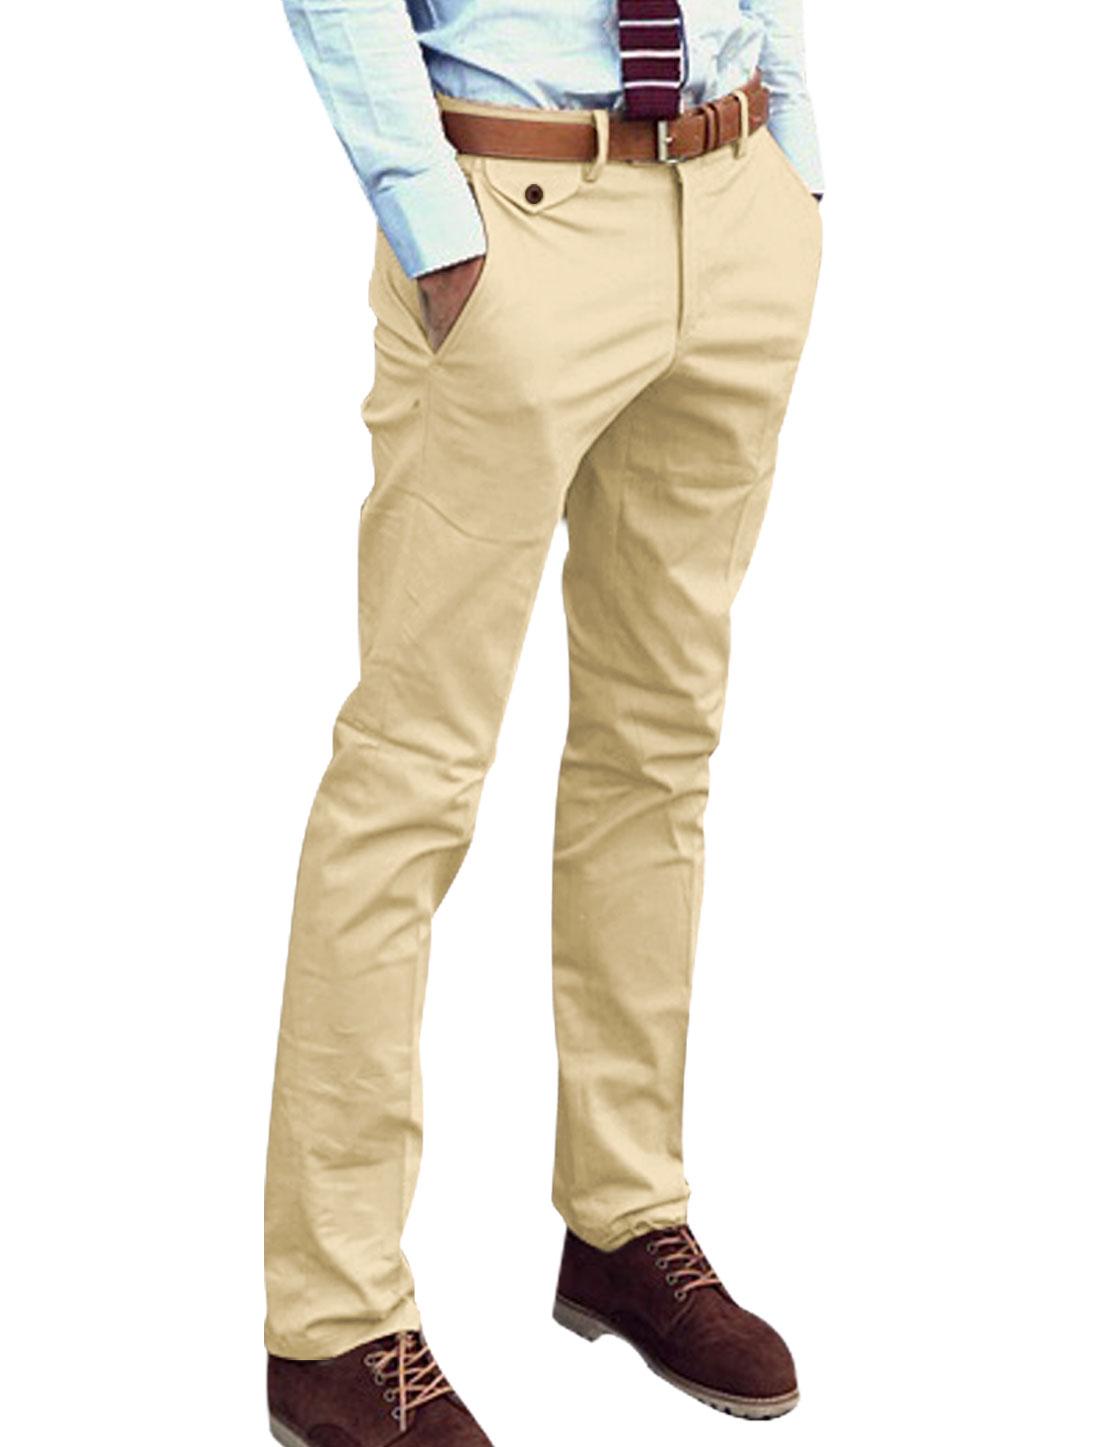 Man's Mid Rise Slant Front Pockets Belt Loop Casual Pants Khaki W30